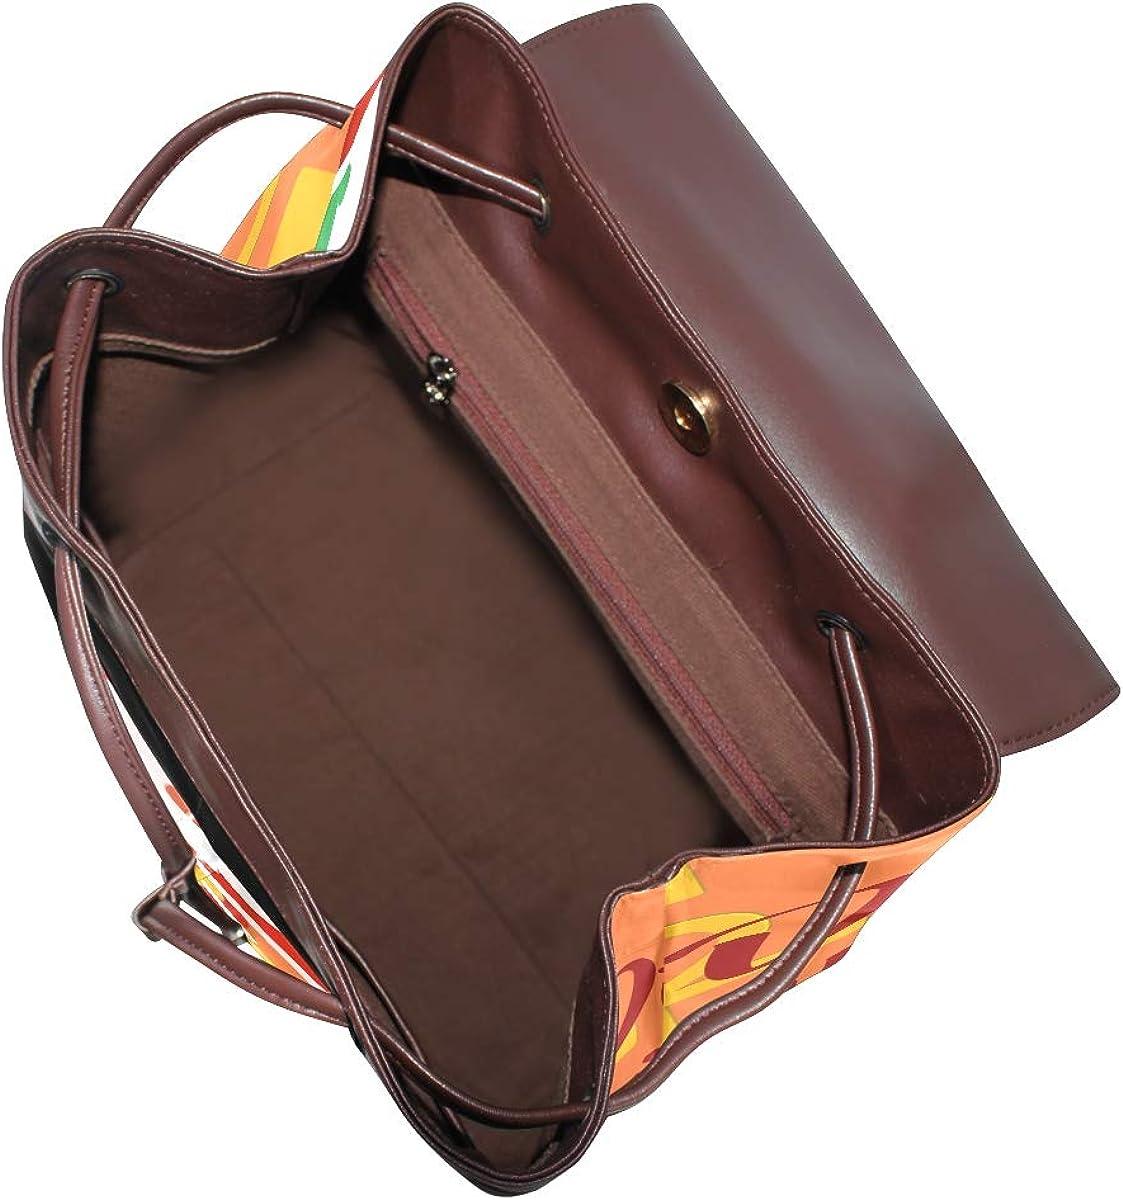 PU Leather Shoulder Bag,Dine With Santa Backpack,Portable Travel School Rucksack,Satchel with Top Handle